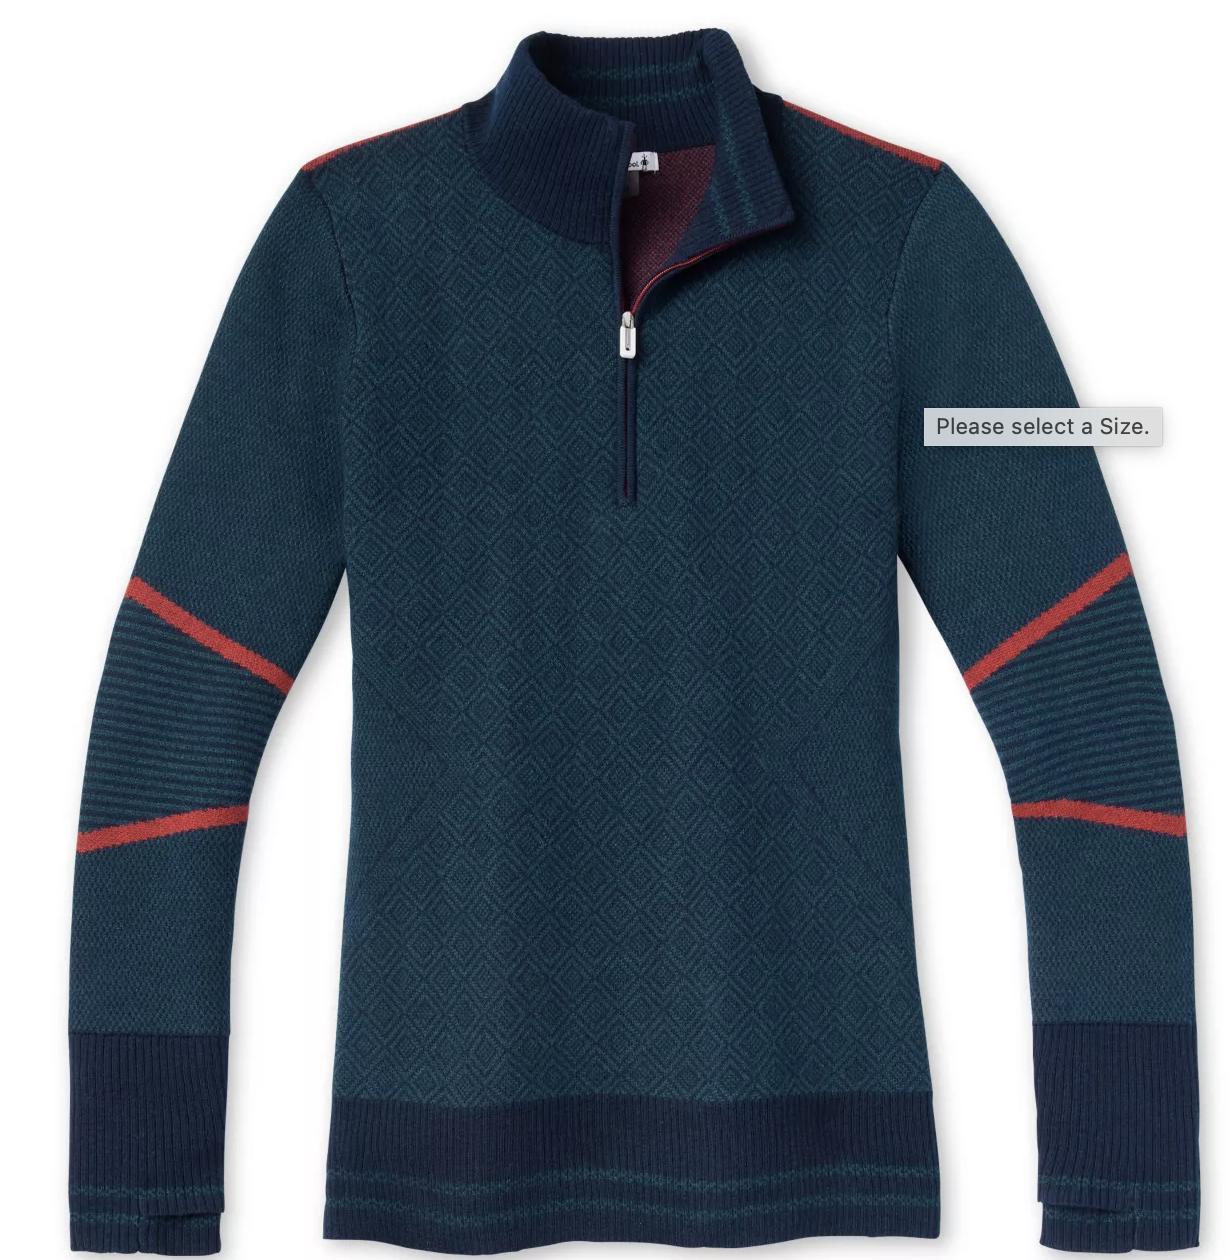 Smartwool Dacono Half Zip Sweater Women's